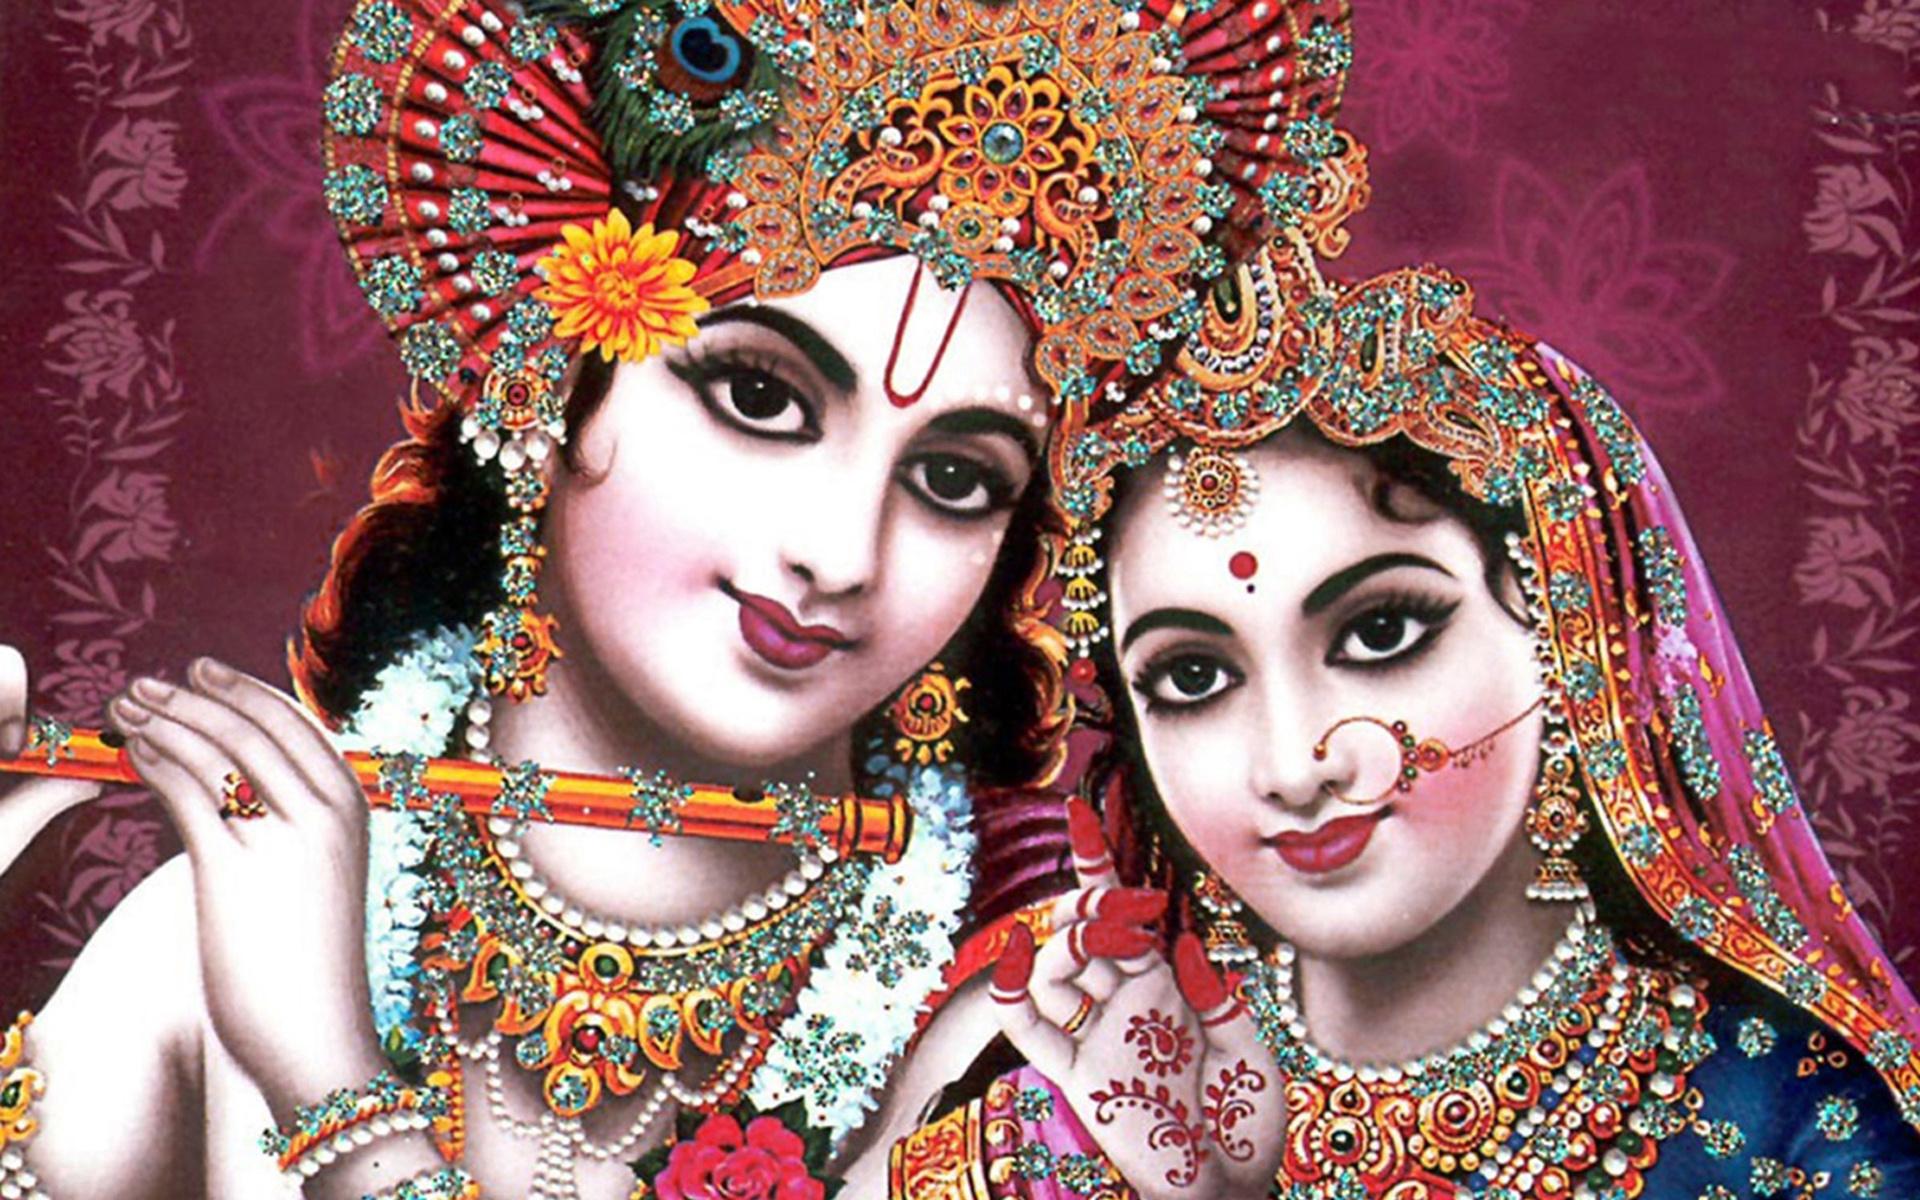 Hd wallpaper radha krishna - Indian God Radha Krishna Wallpapers Hd Wallpapers